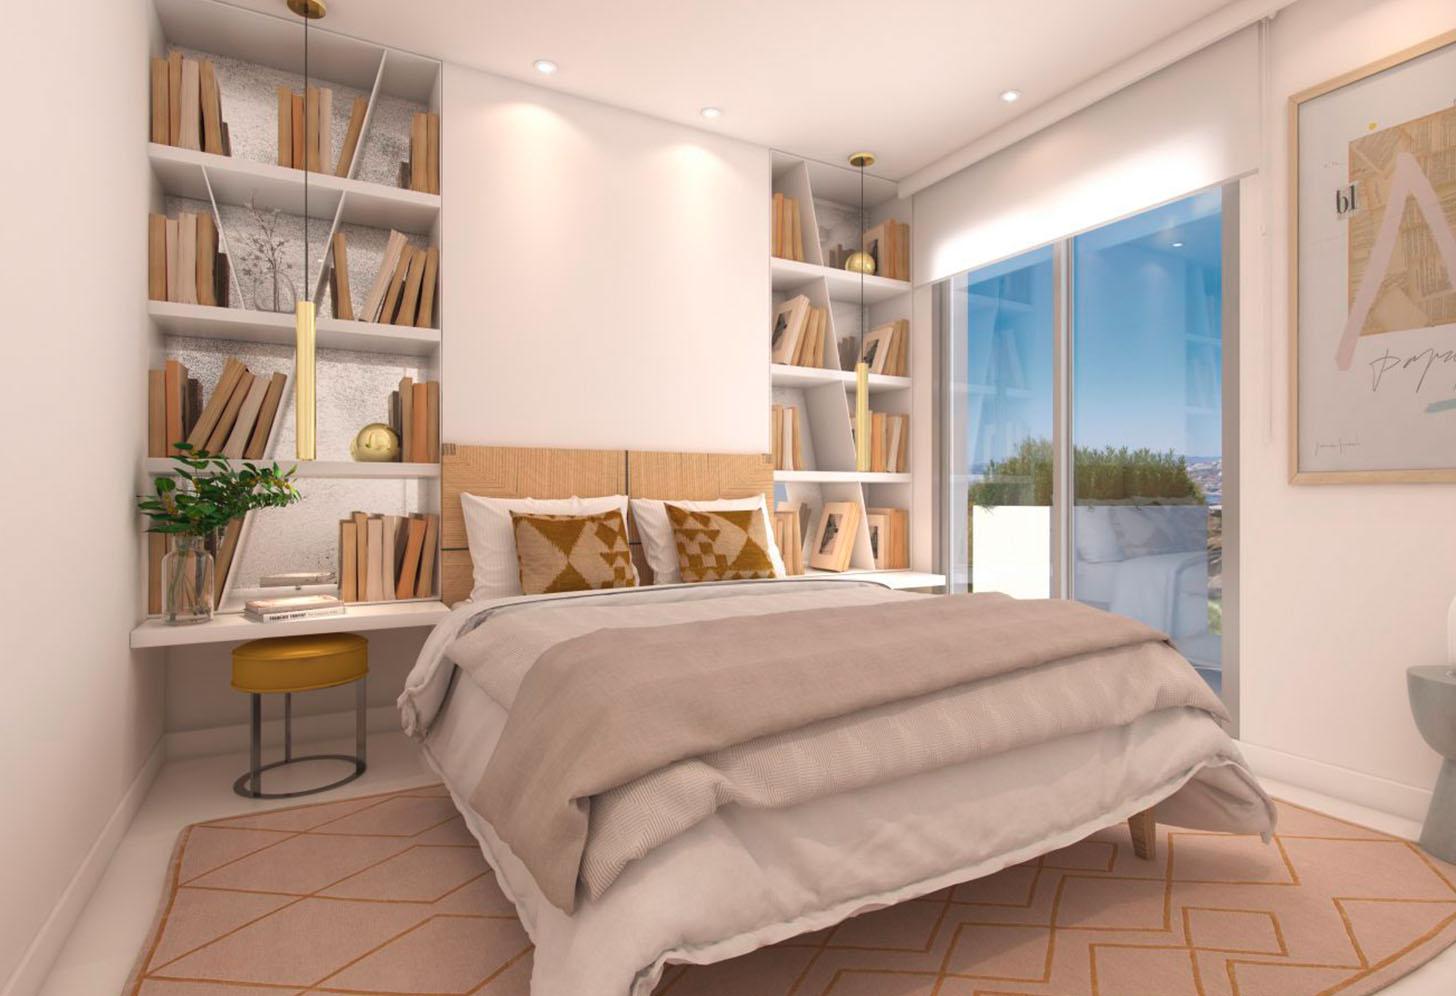 immobilier neuf espagne costa sol chambre 2